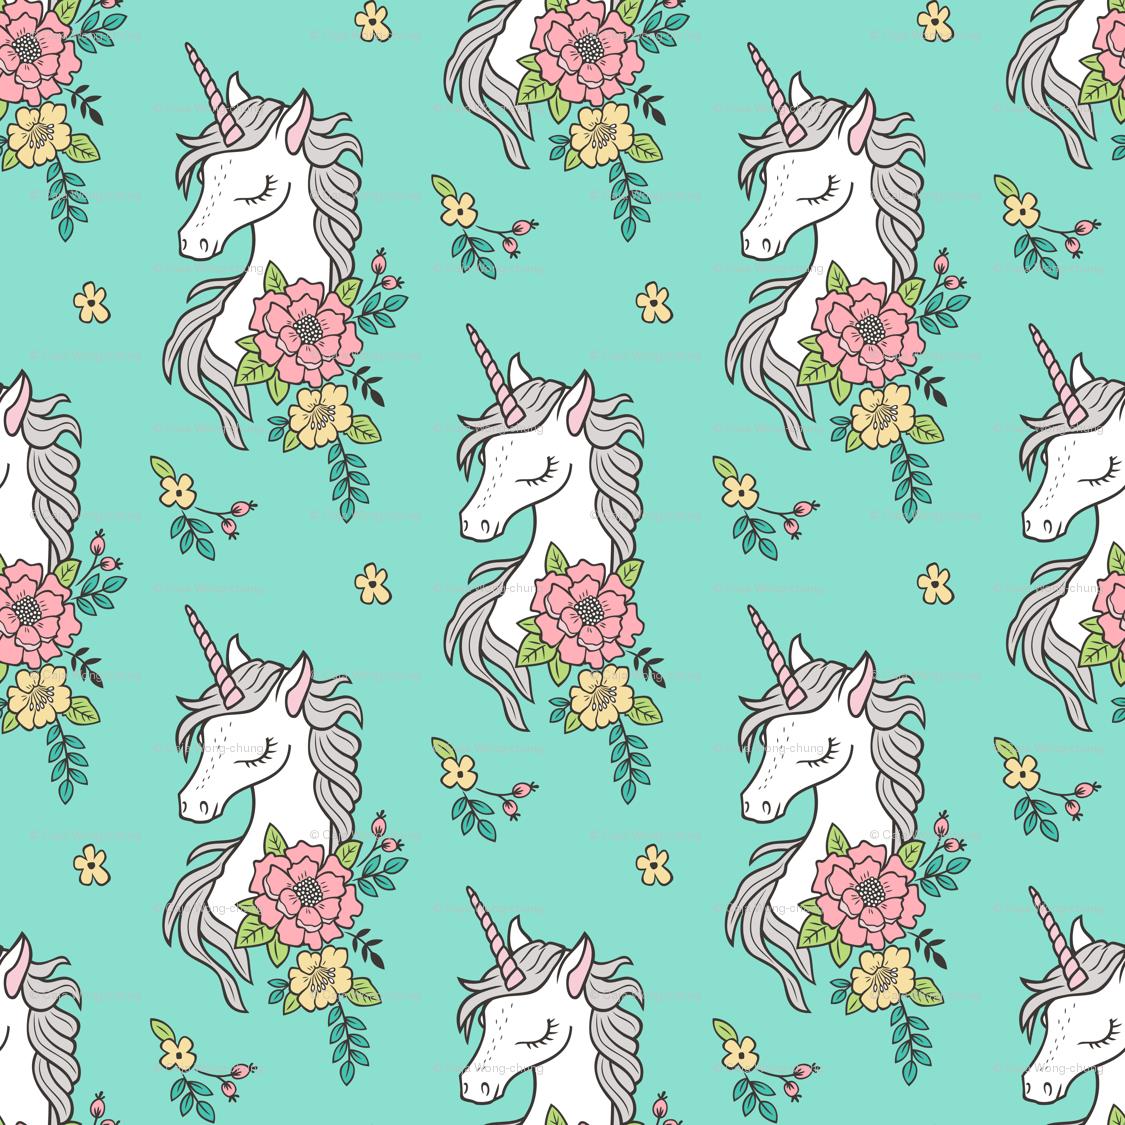 55 Tumblr Wallpapers Unicorn Tumblr Wallpapers Unicorn Unicorn 747734 Hd Wallpaper Backgrounds Download